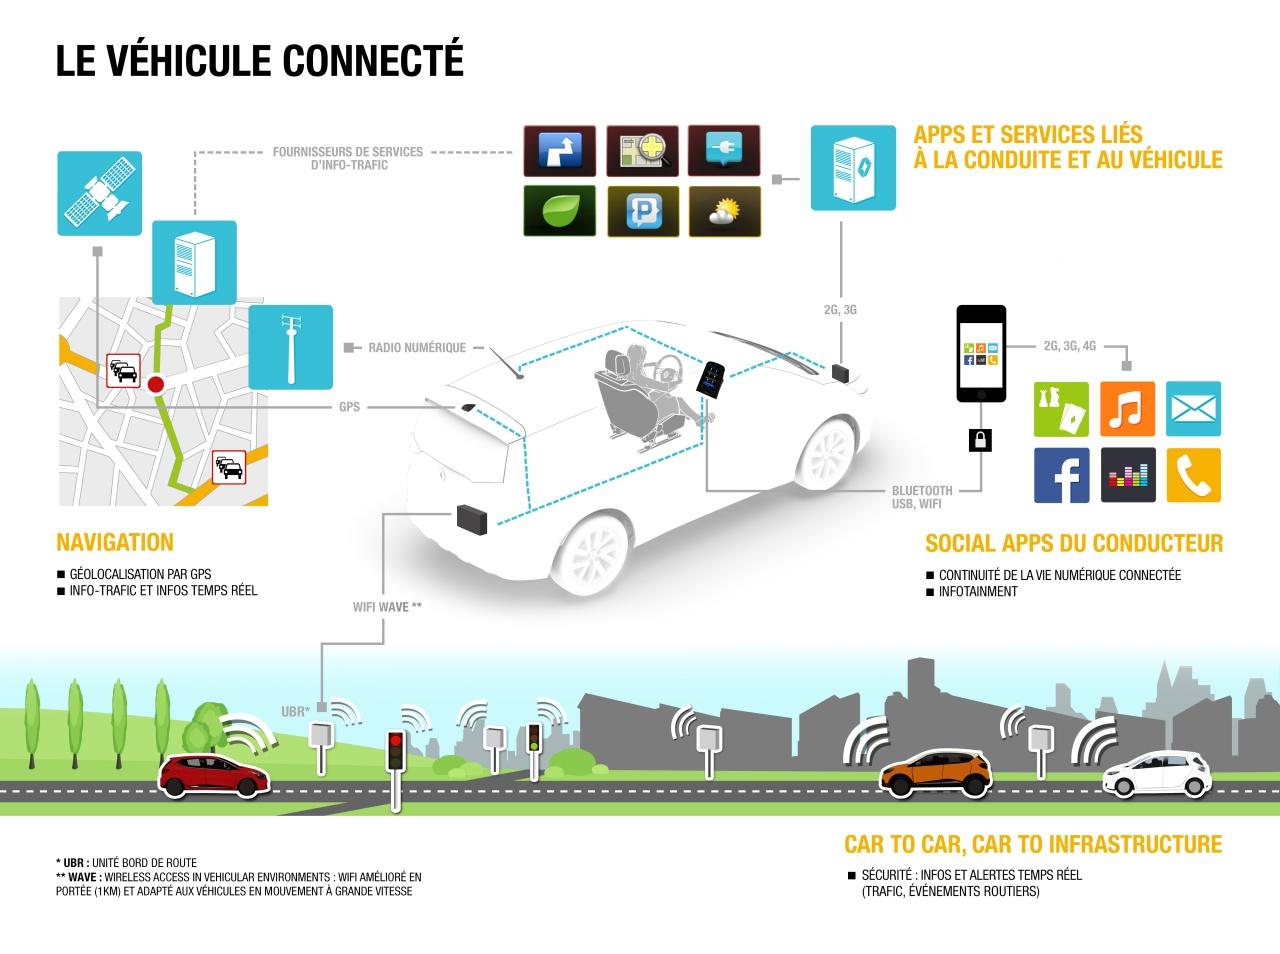 Véhicule connecté - Infographie by Renault